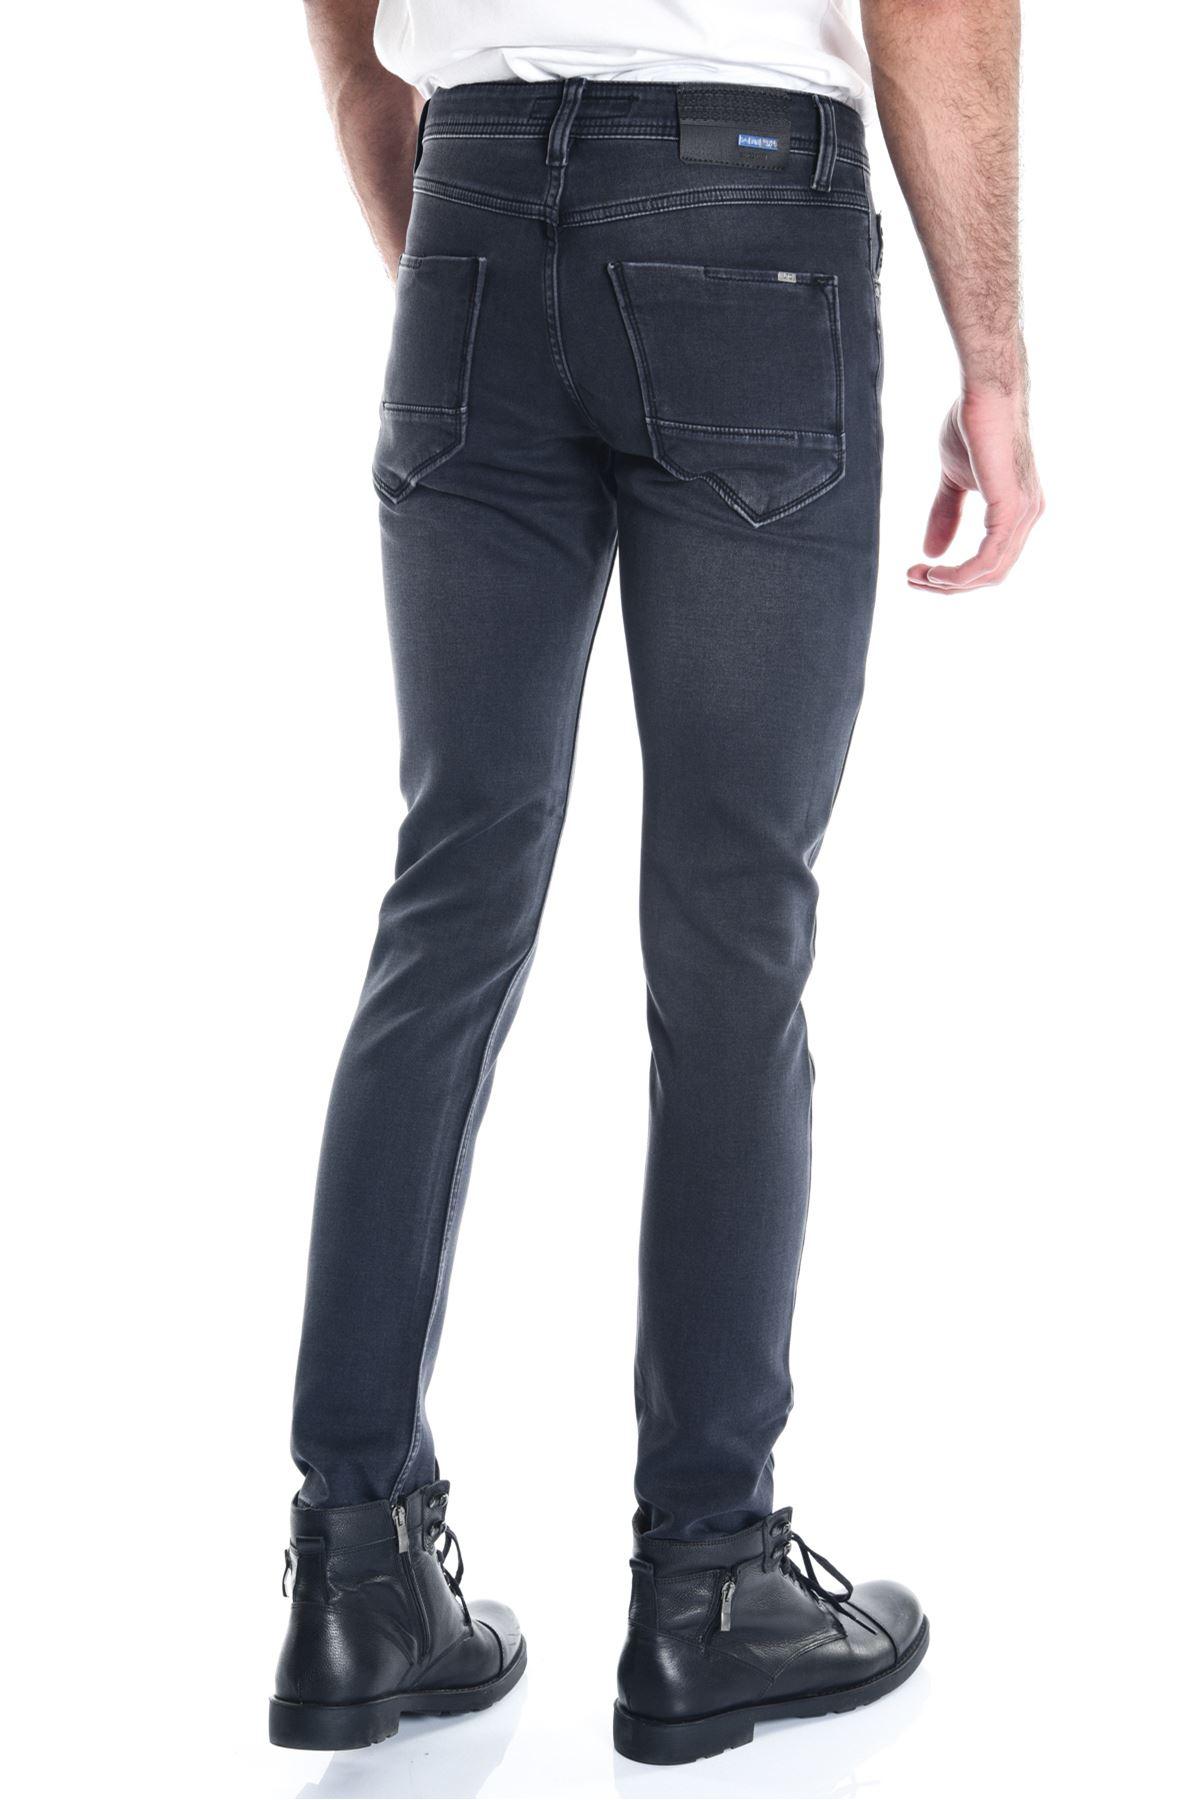 Siyah Örme Rodeo Slimfit Erkek Kot Pantolon